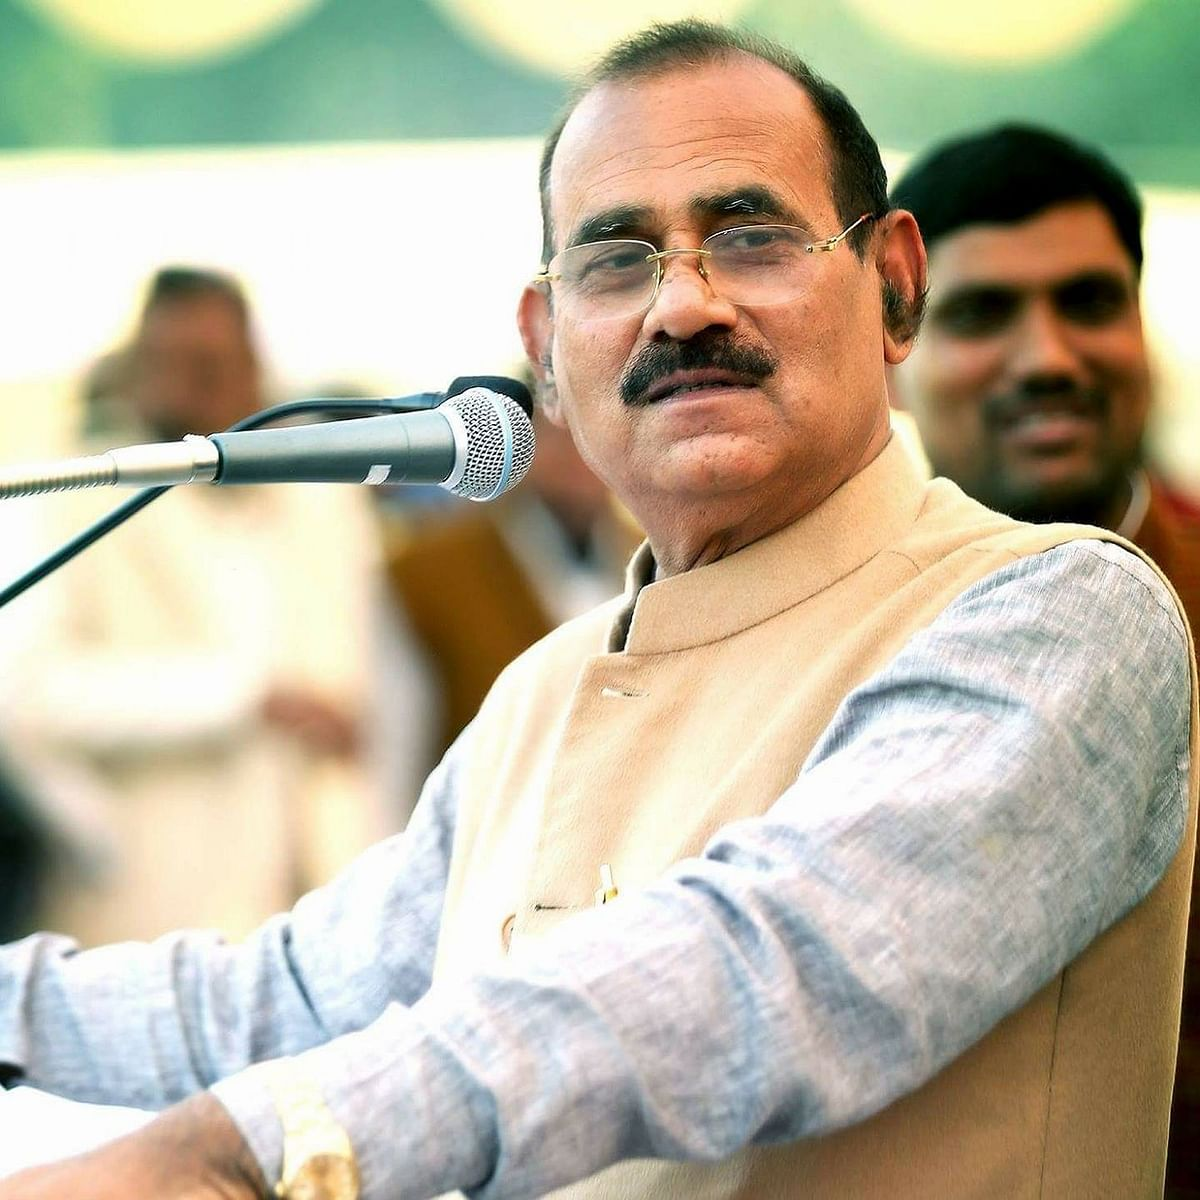 Uttar Pradesh: Jailed in property grab case, another FIR filed against MLA Vijay Mishra